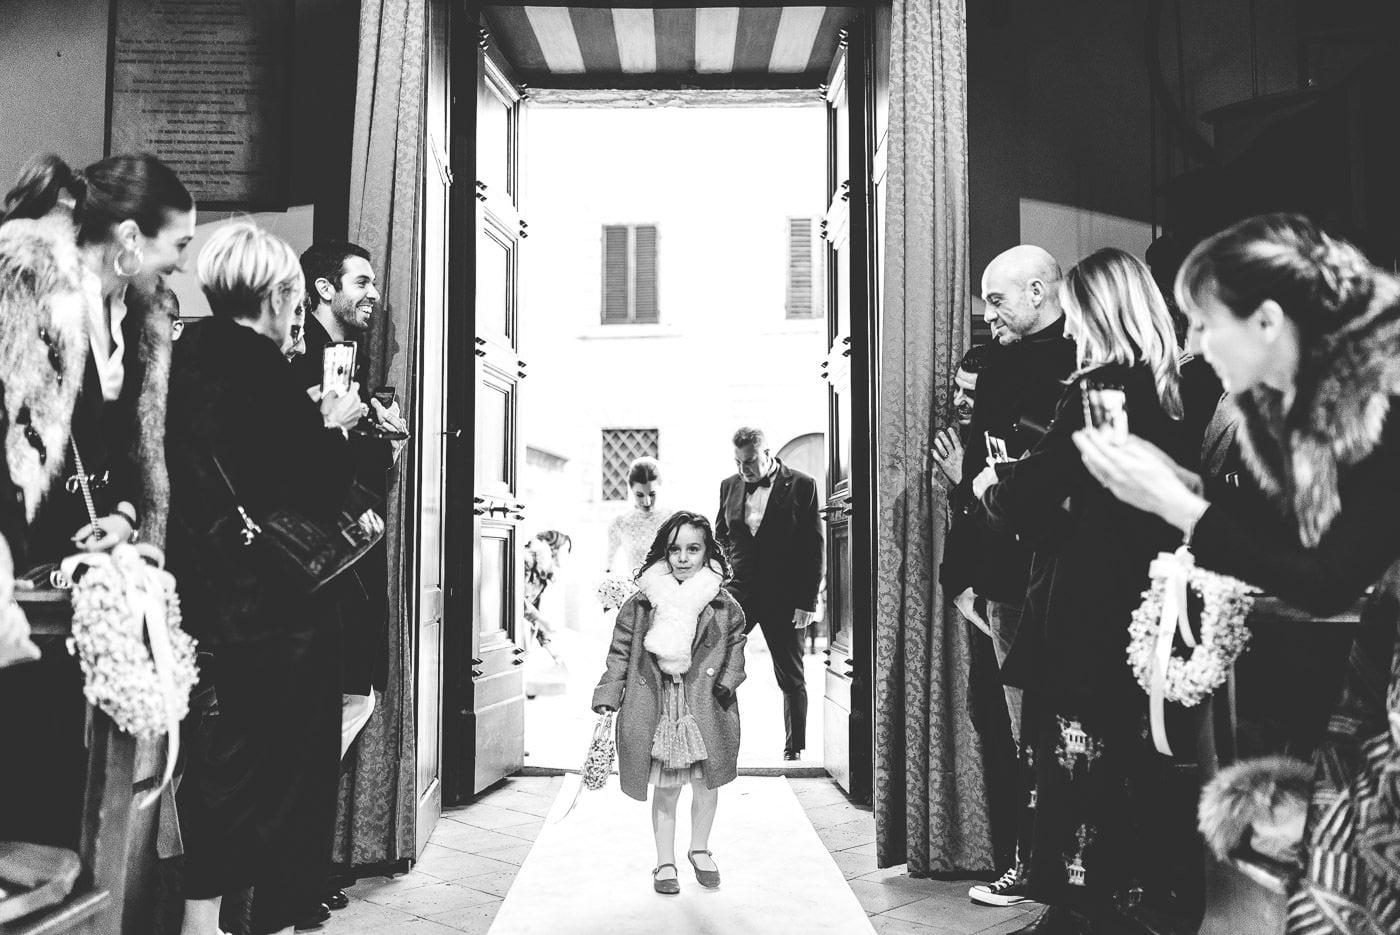 Matrimonio Giulia & Alessandro 28_12 – Alessio Nobili Photographer-17